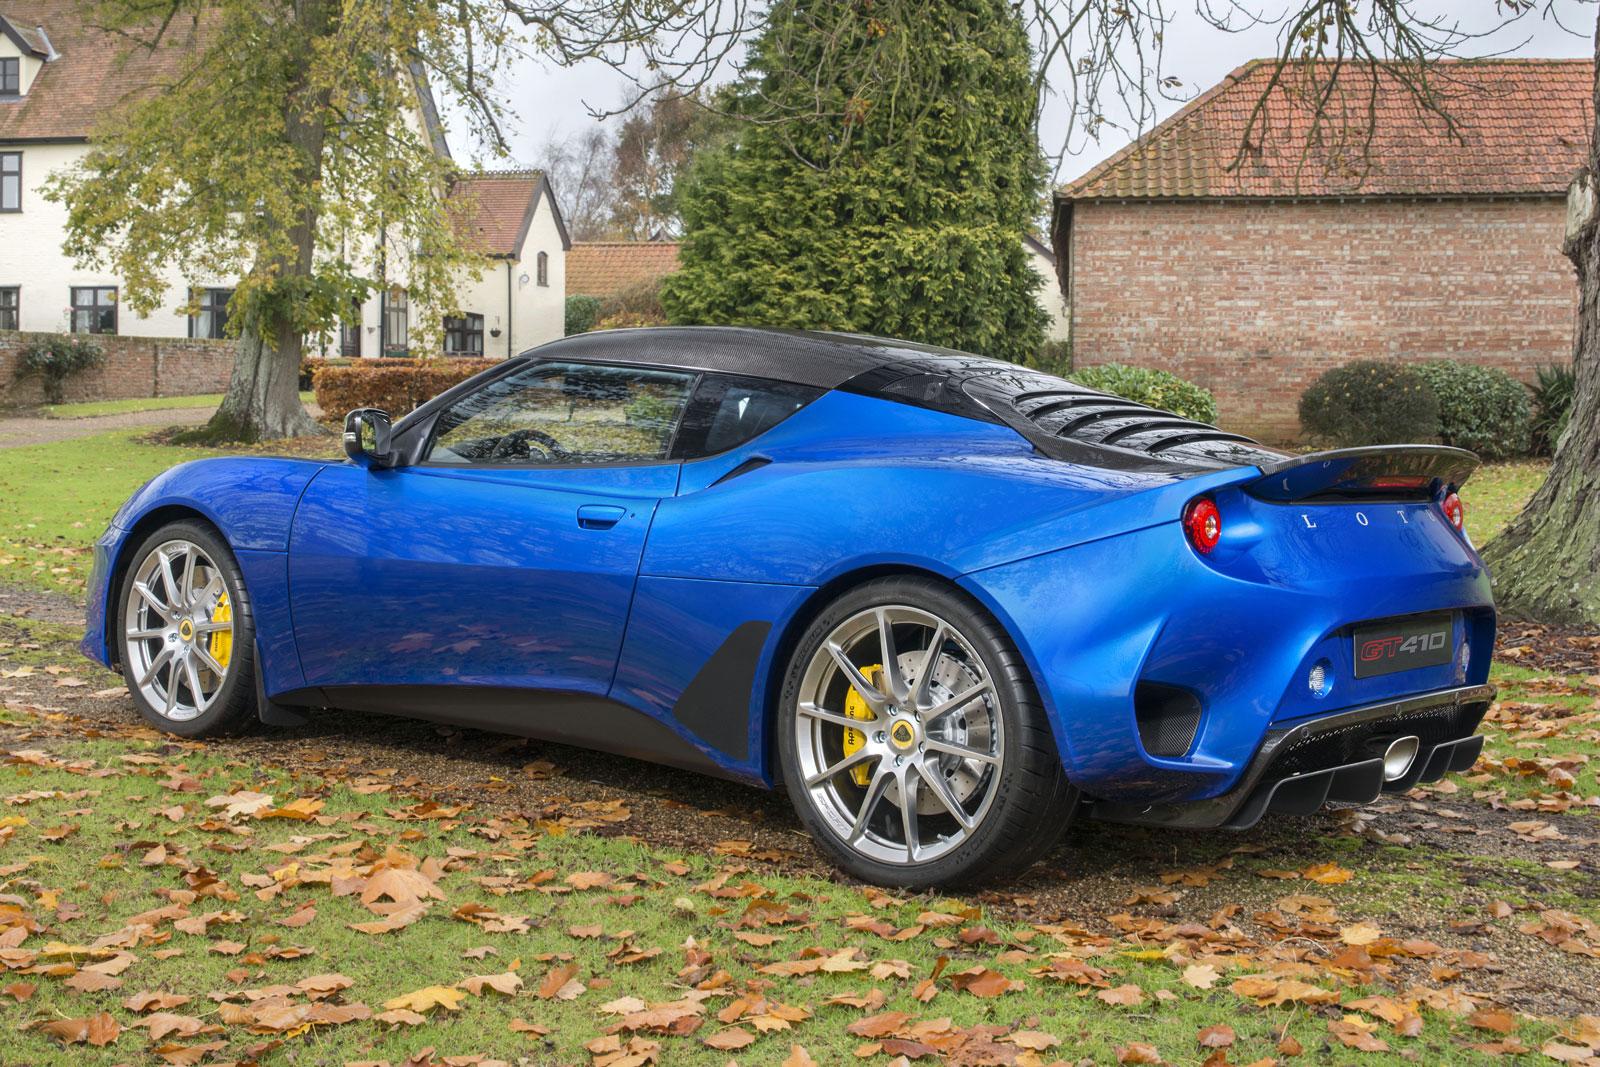 https://www.autocar.co.uk/sites/autocar.co.uk/files/images/car-reviews/first-drives/legacy/lotus-evora-gt410-sport-january-2018-2.jpg